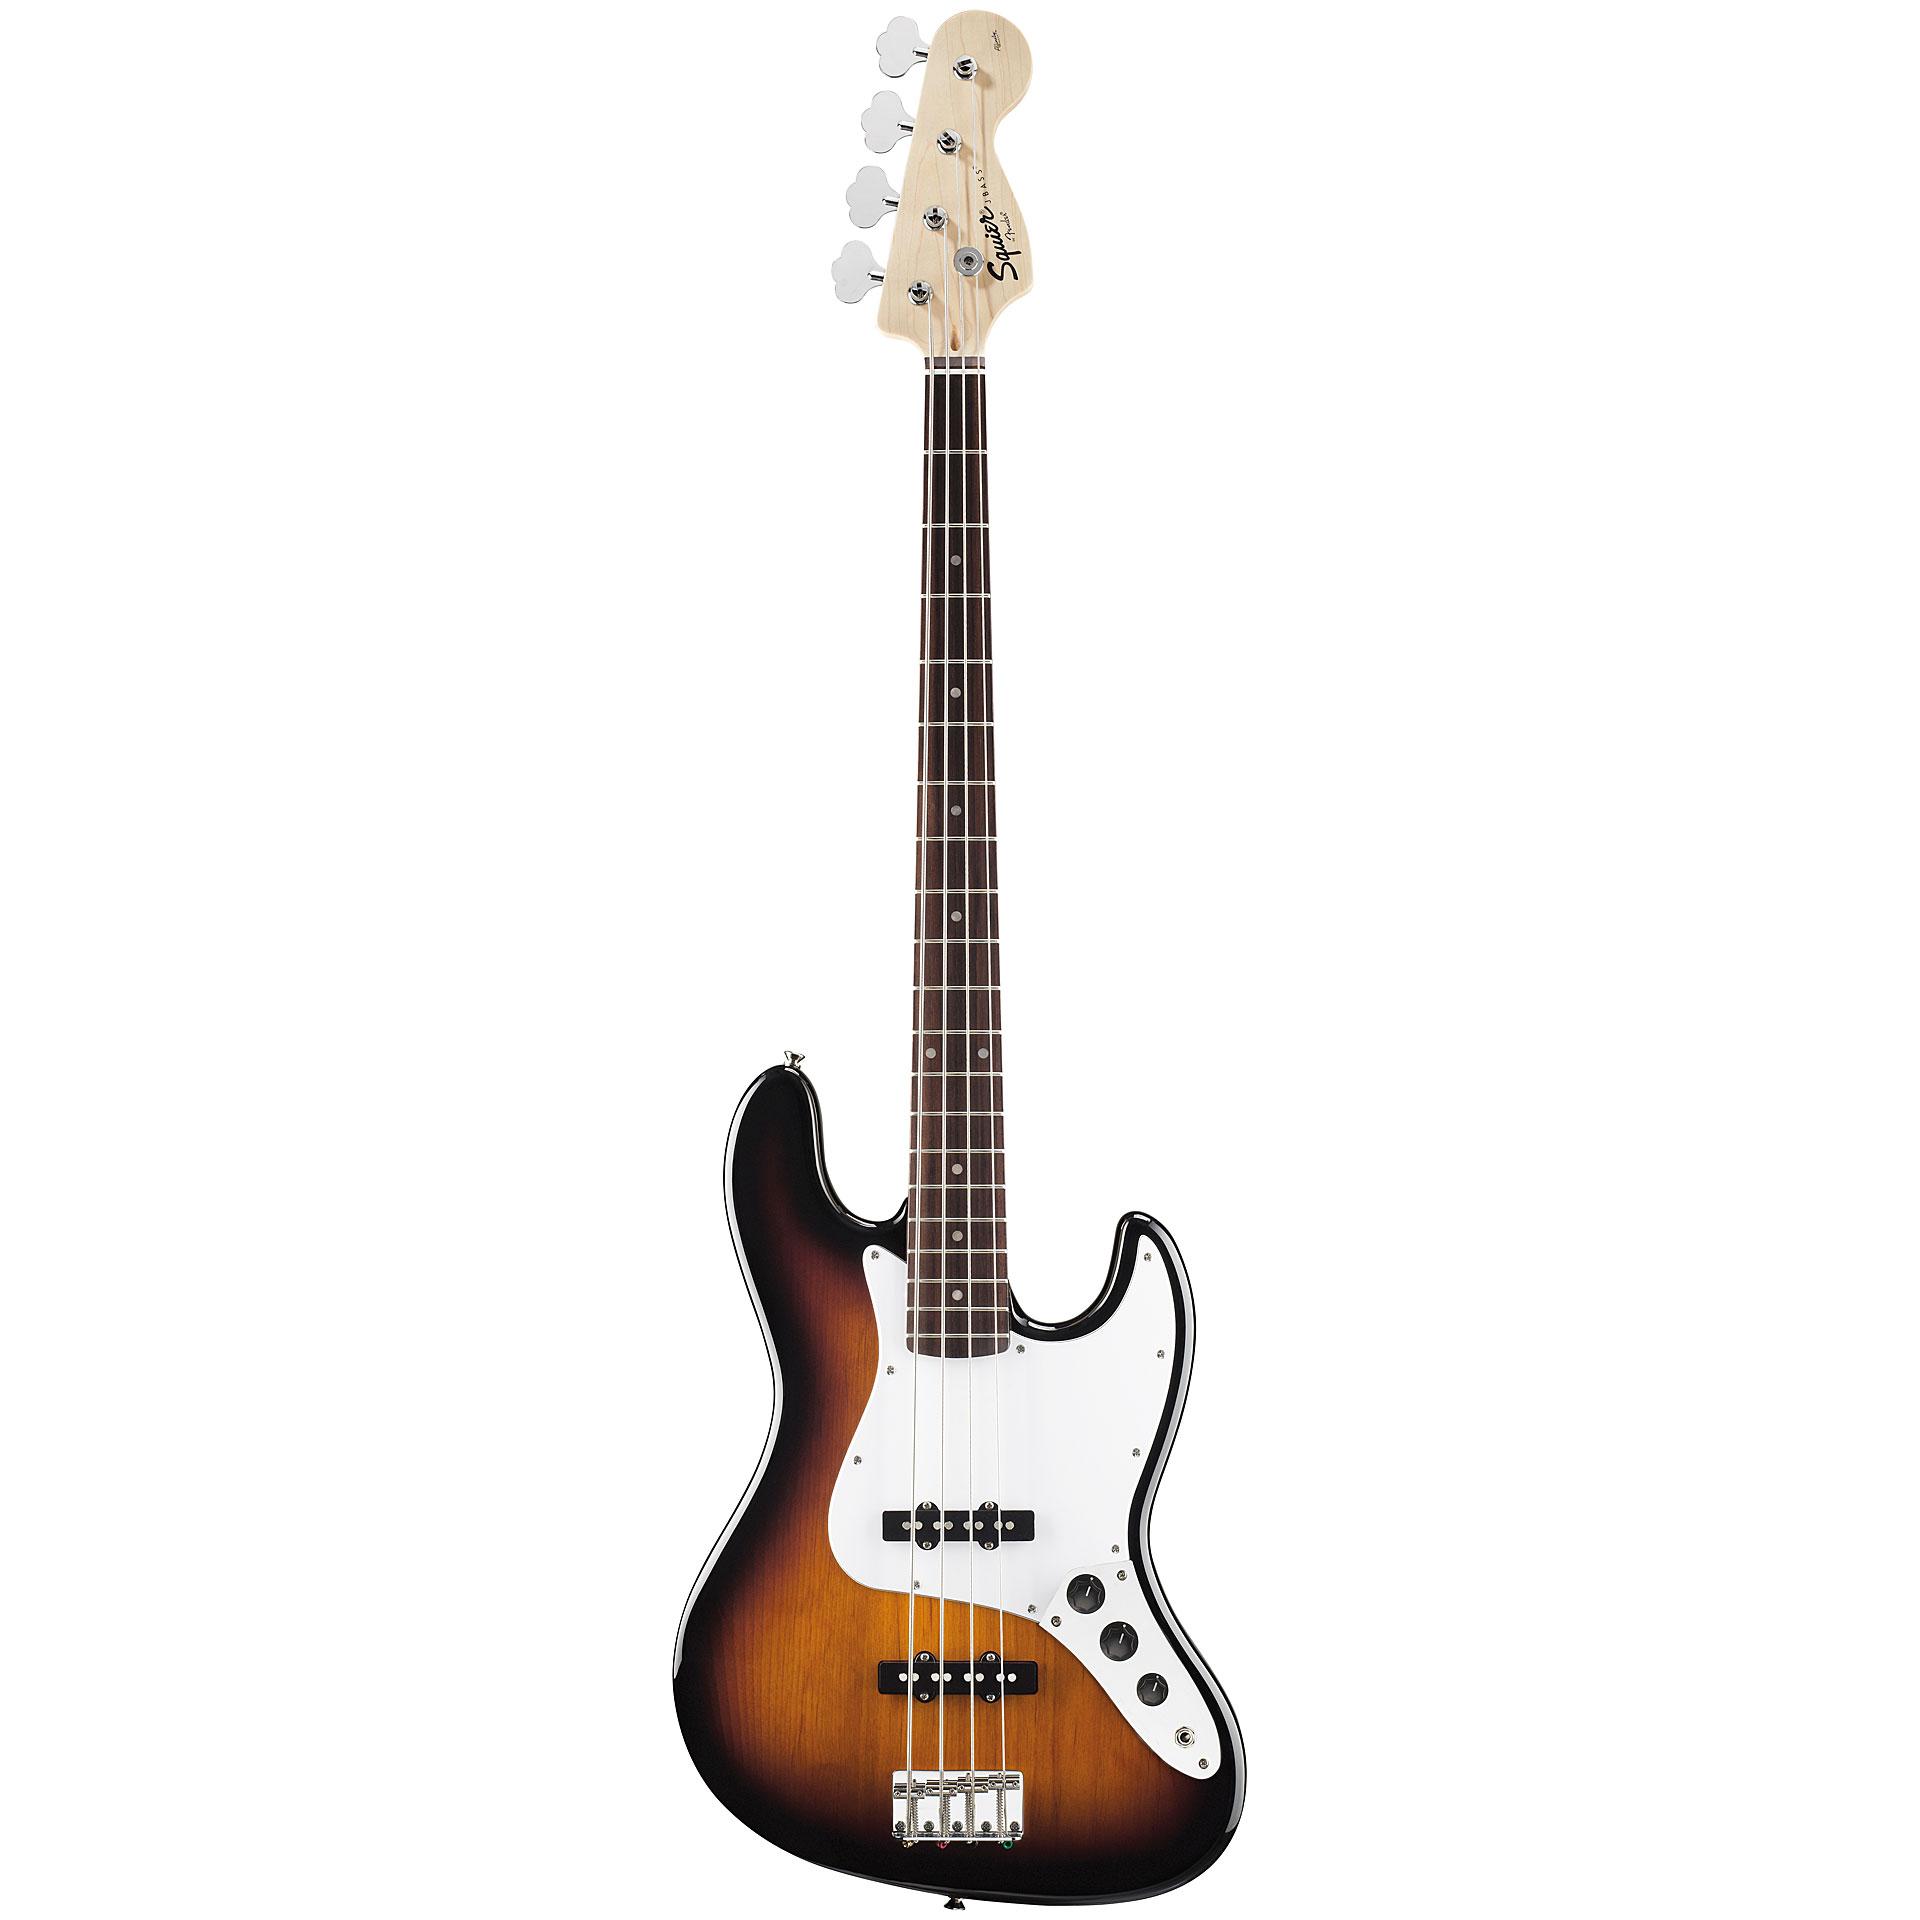 squier affinity j bass bsb electric bass guitar. Black Bedroom Furniture Sets. Home Design Ideas